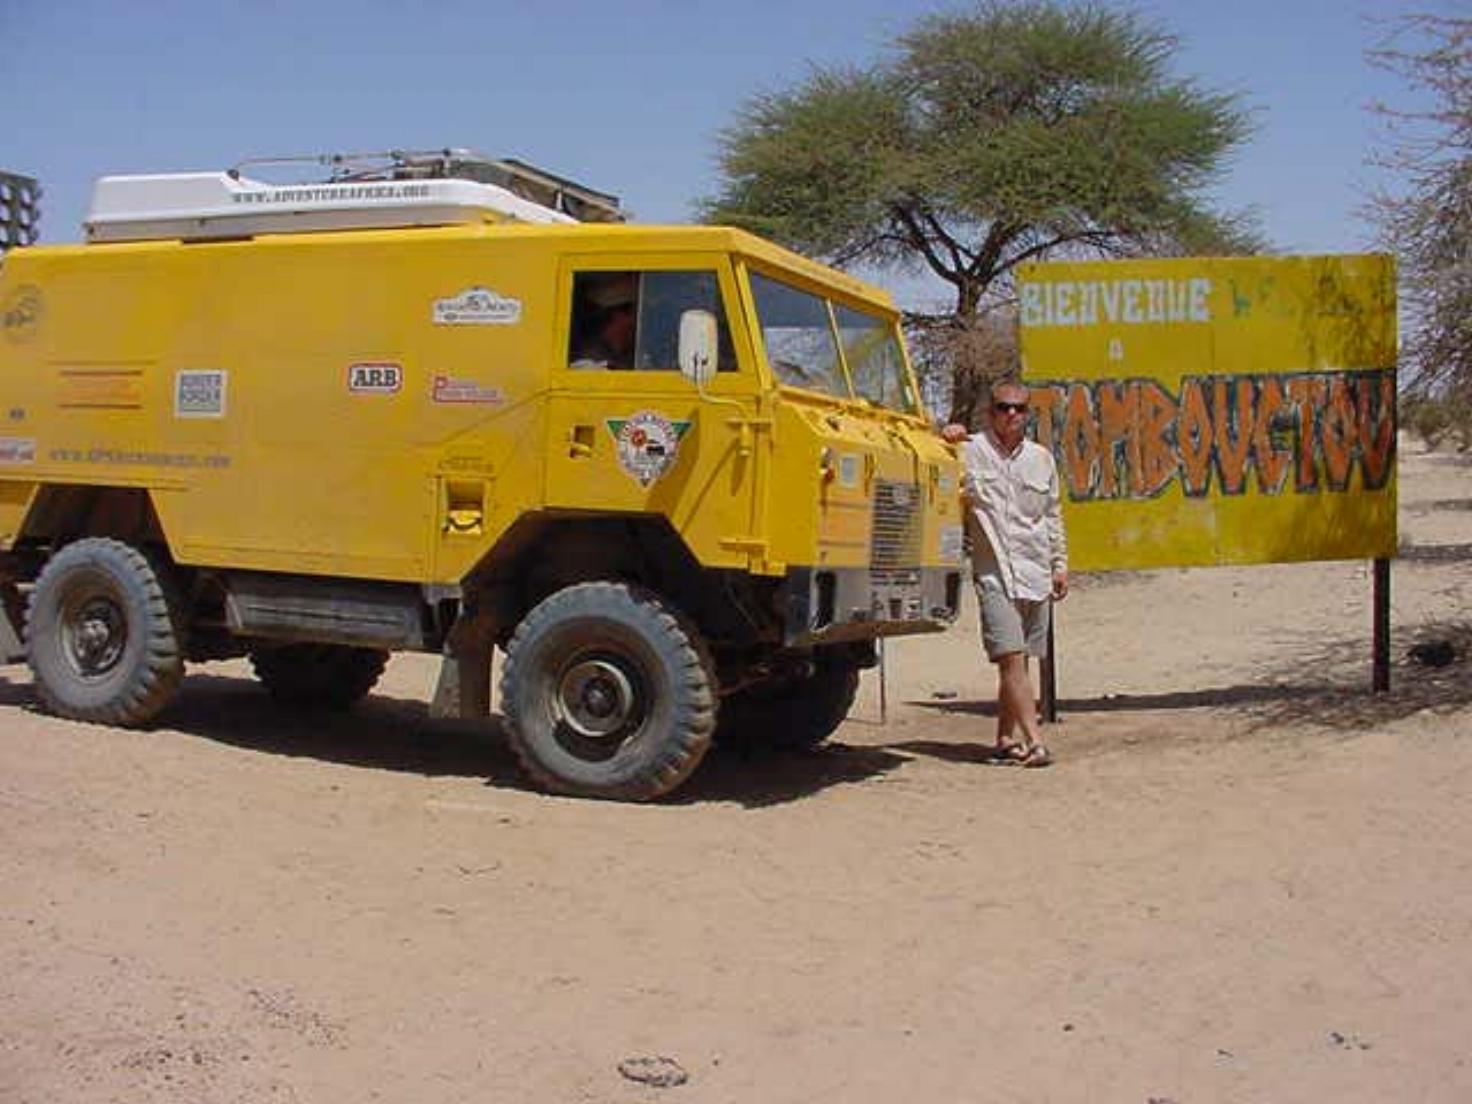 Shane Ballensky in Timbuktu Mali